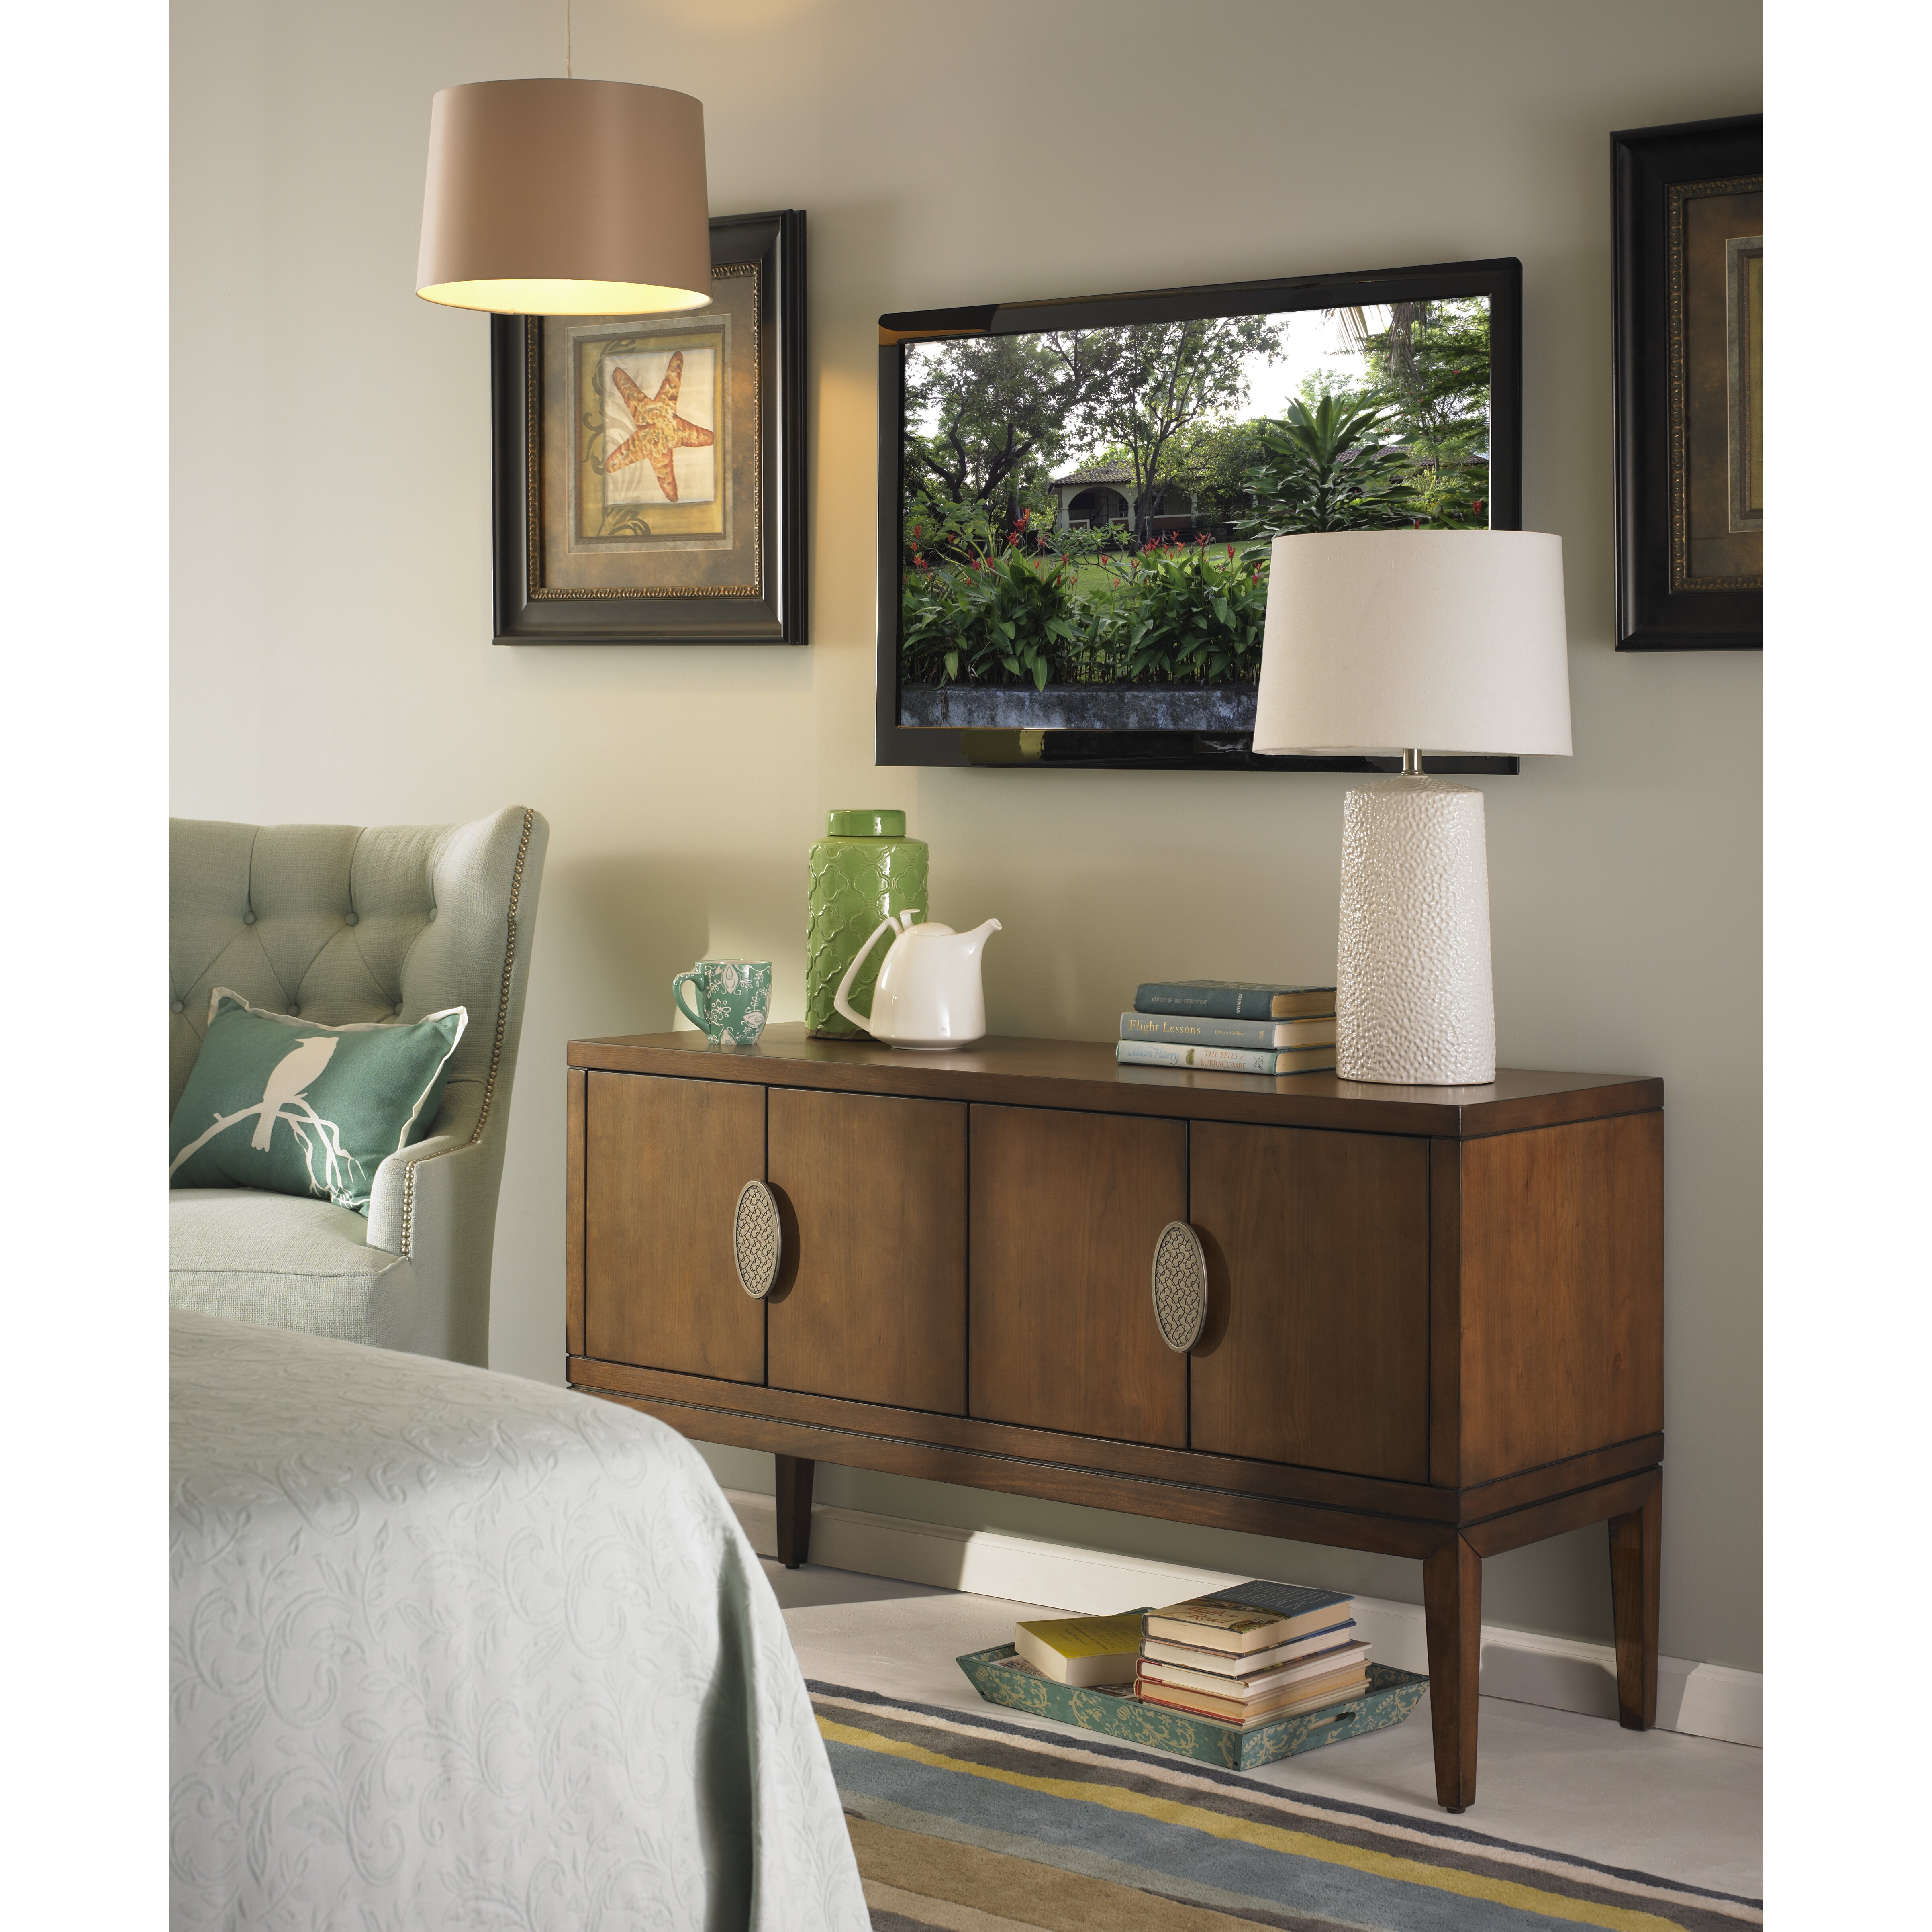 somerton dwelling claire de lune console table reviews. Black Bedroom Furniture Sets. Home Design Ideas